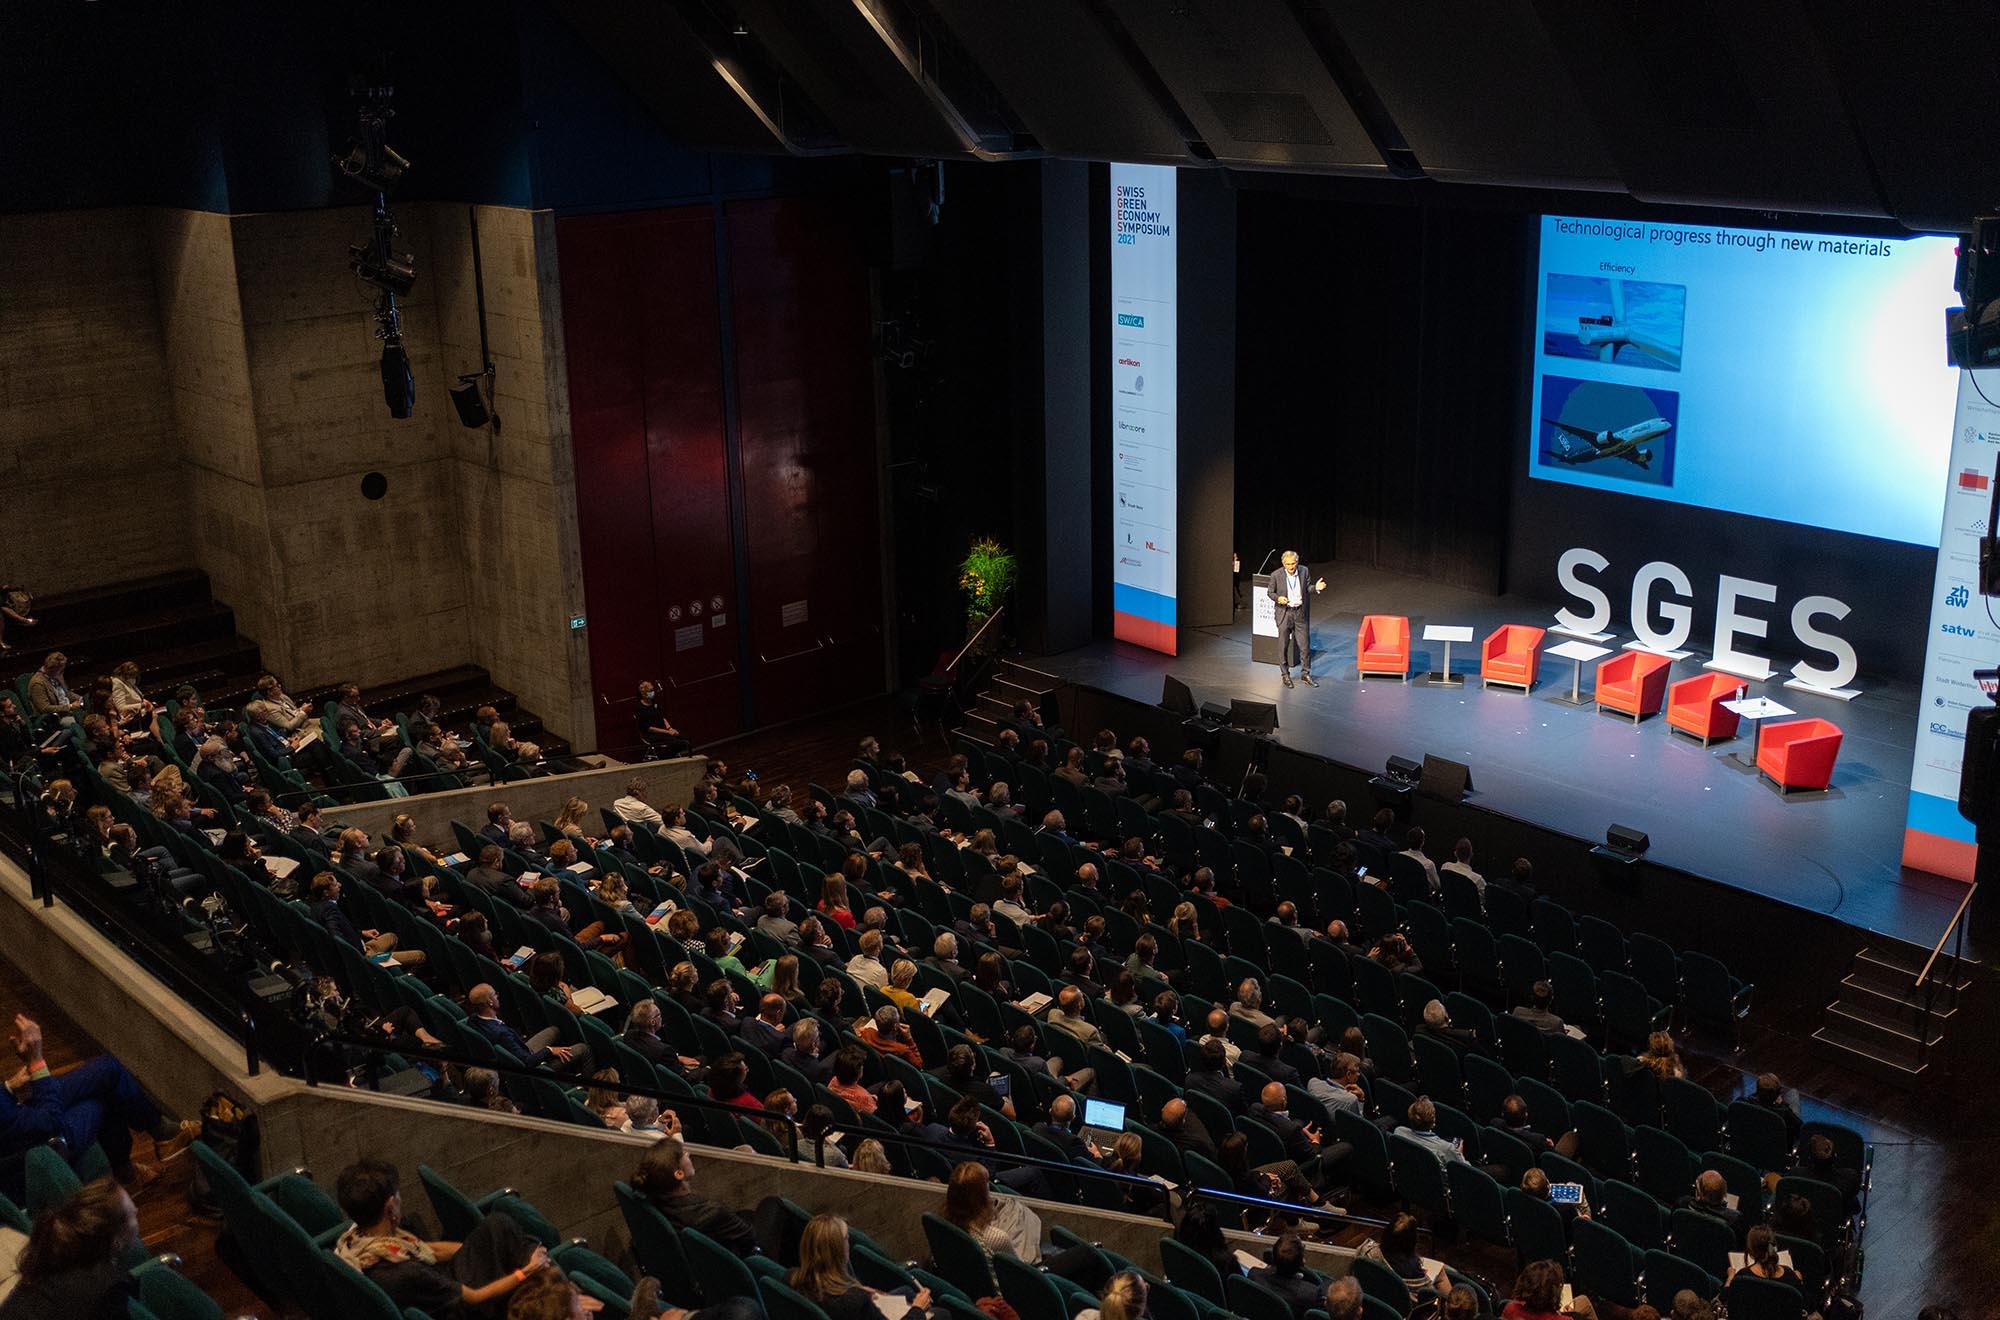 SGES Keynote: Prof. Dr. Gian-Luca Bona, Direktor, Empa